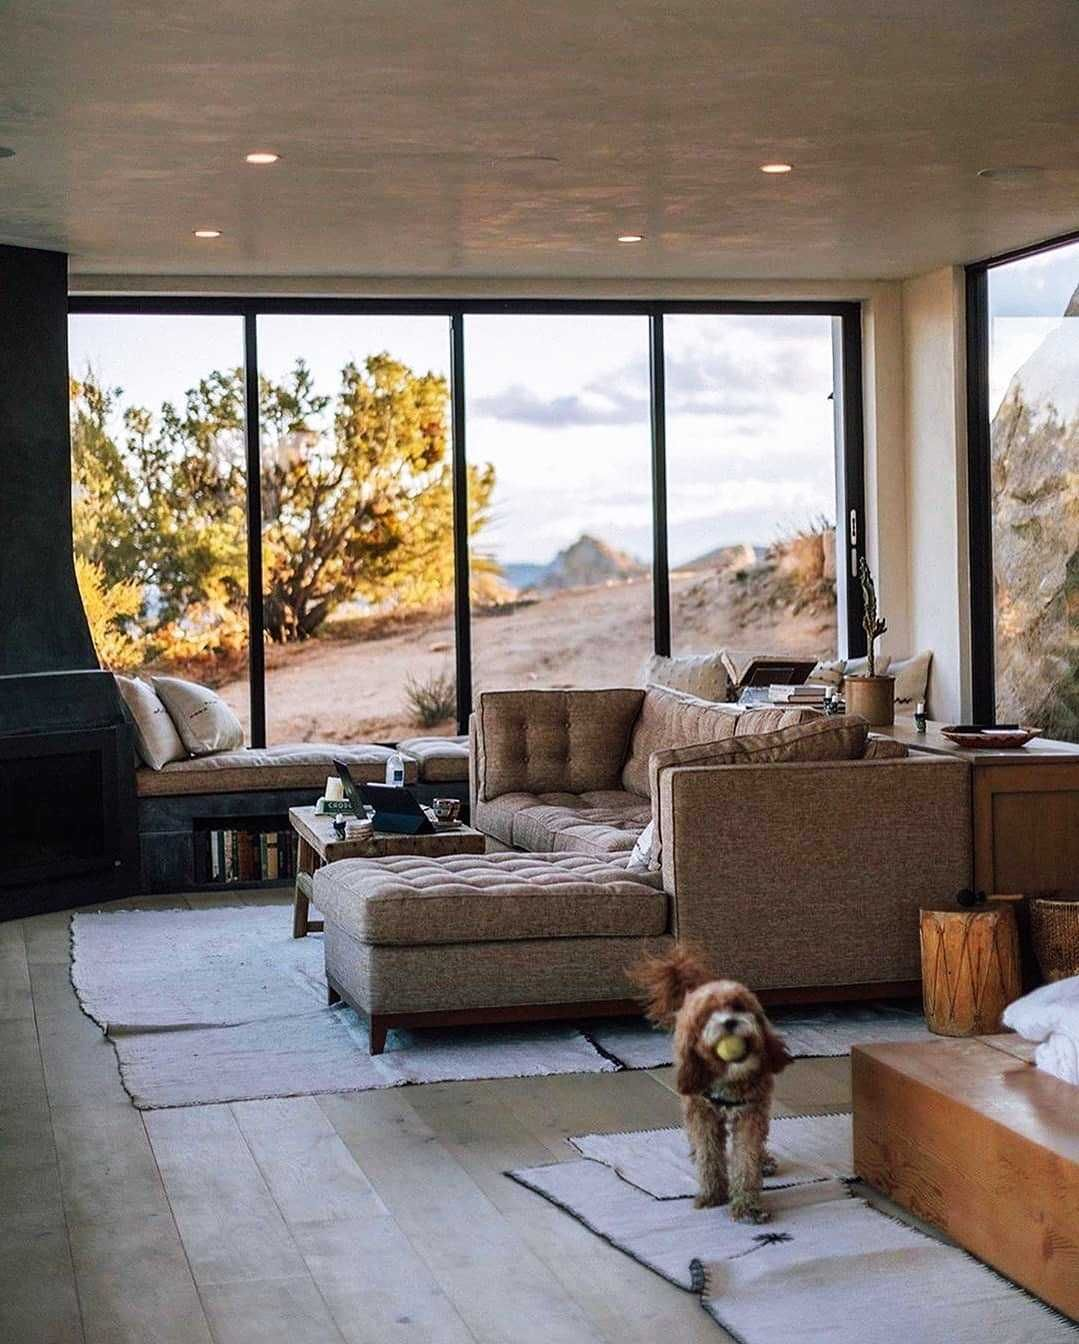 +200 Modern Home Interior Decor Ideas In 2020